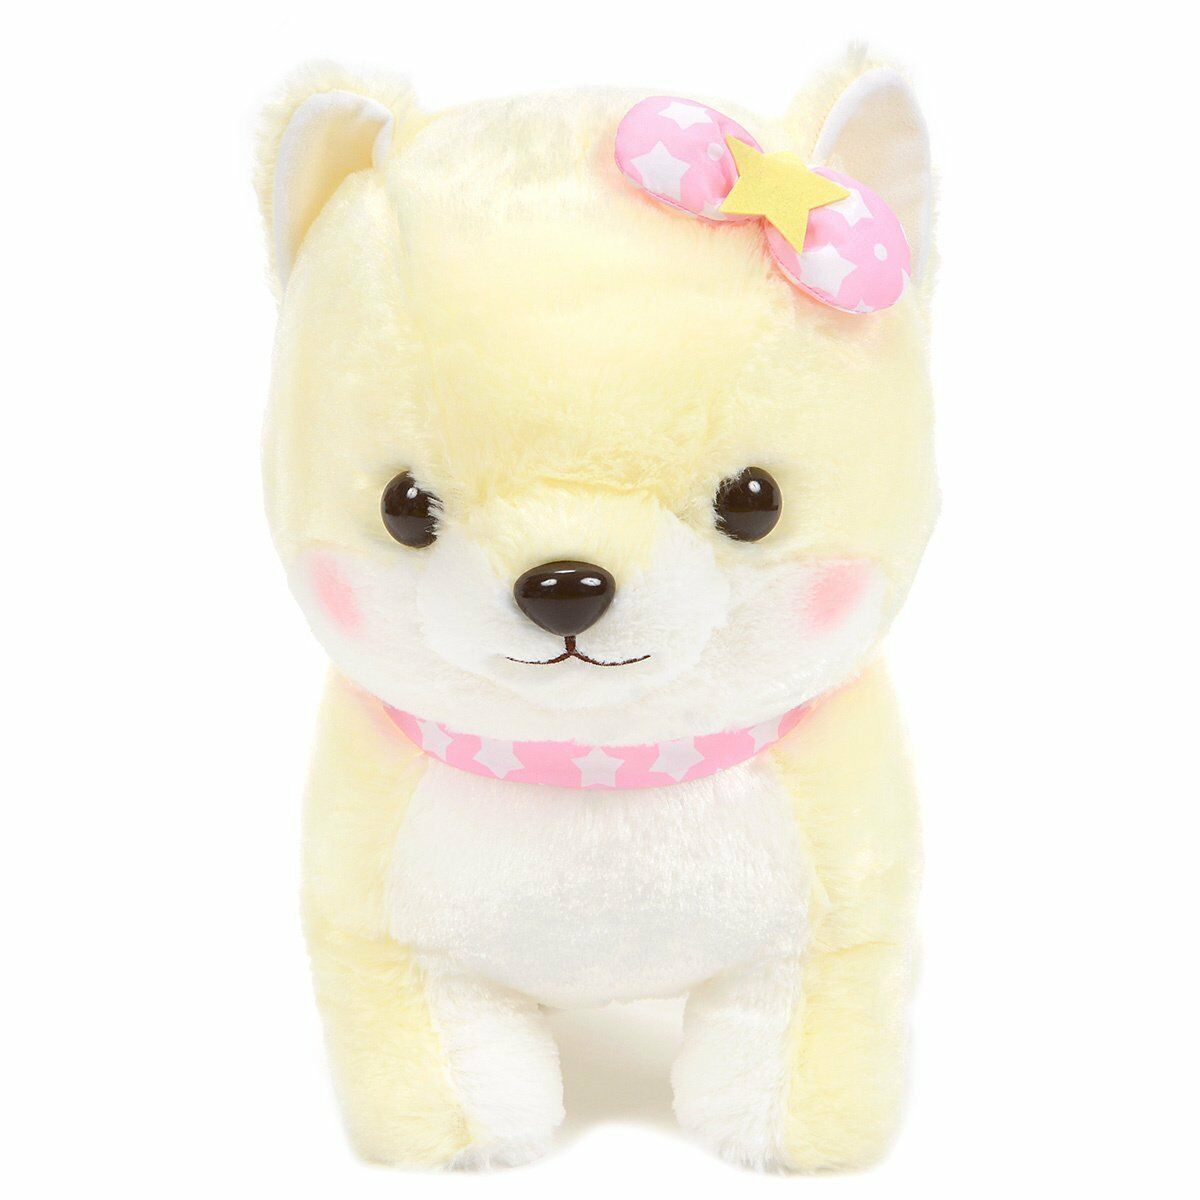 Amuse Plush Shiba Dog Pastel Gelb Kawaii Stuffed Animal 17 Inches BIG Größe